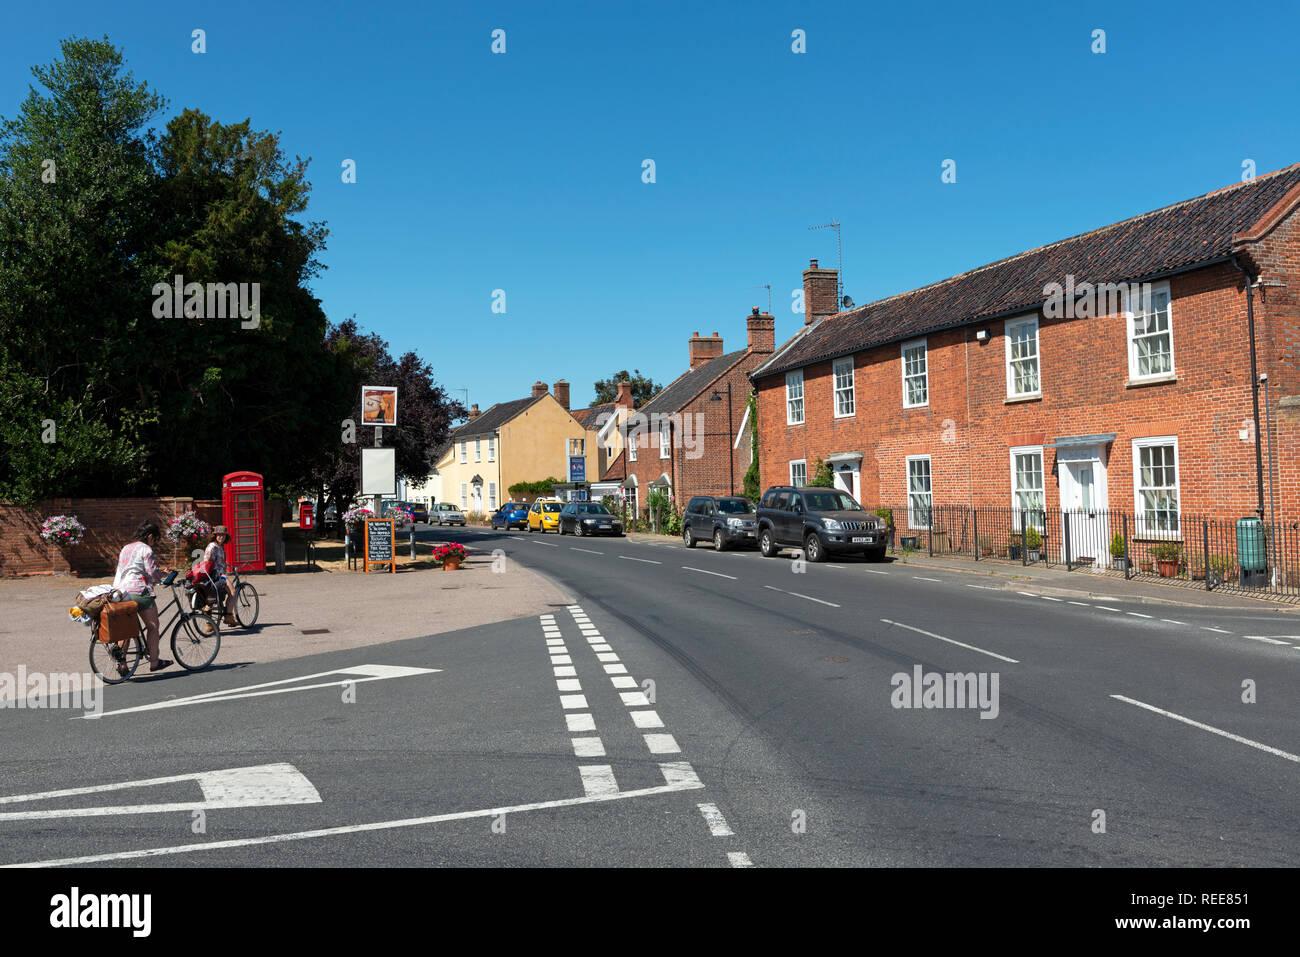 Bramfield, Suffolk, England. - Stock Image